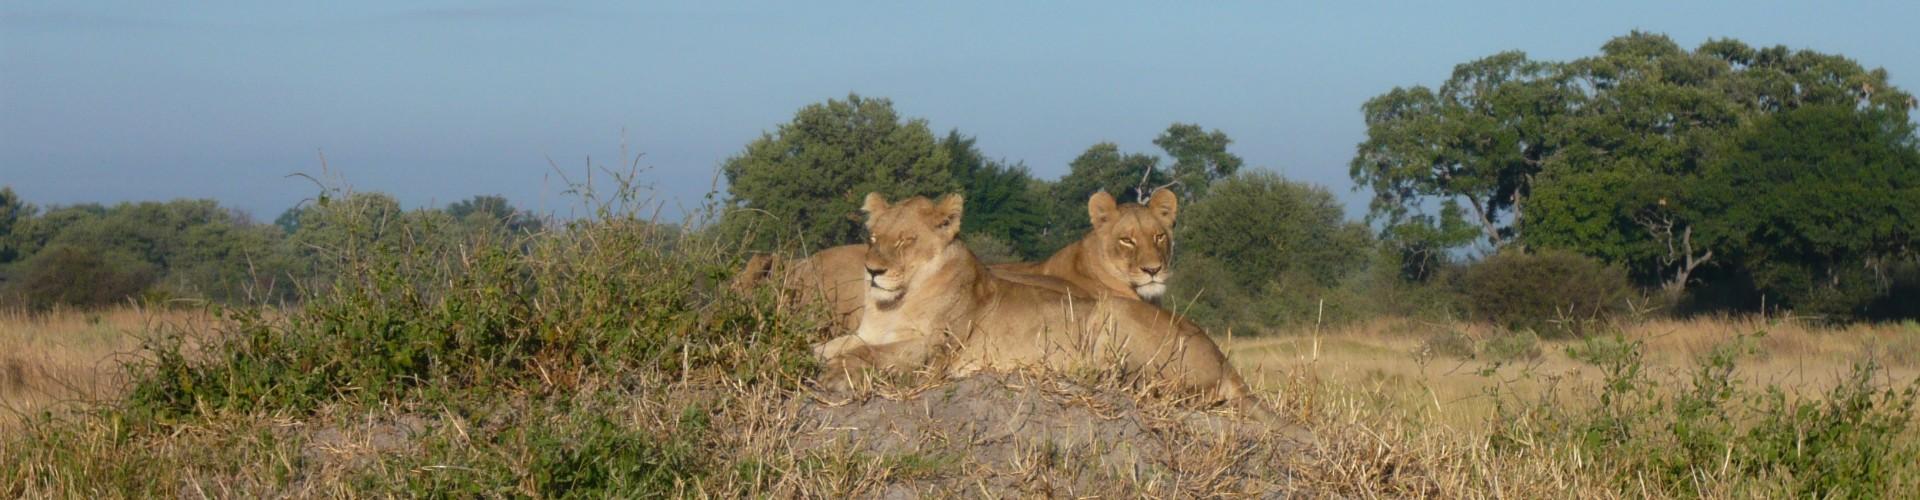 Botswana Lions Educational May 2008 100